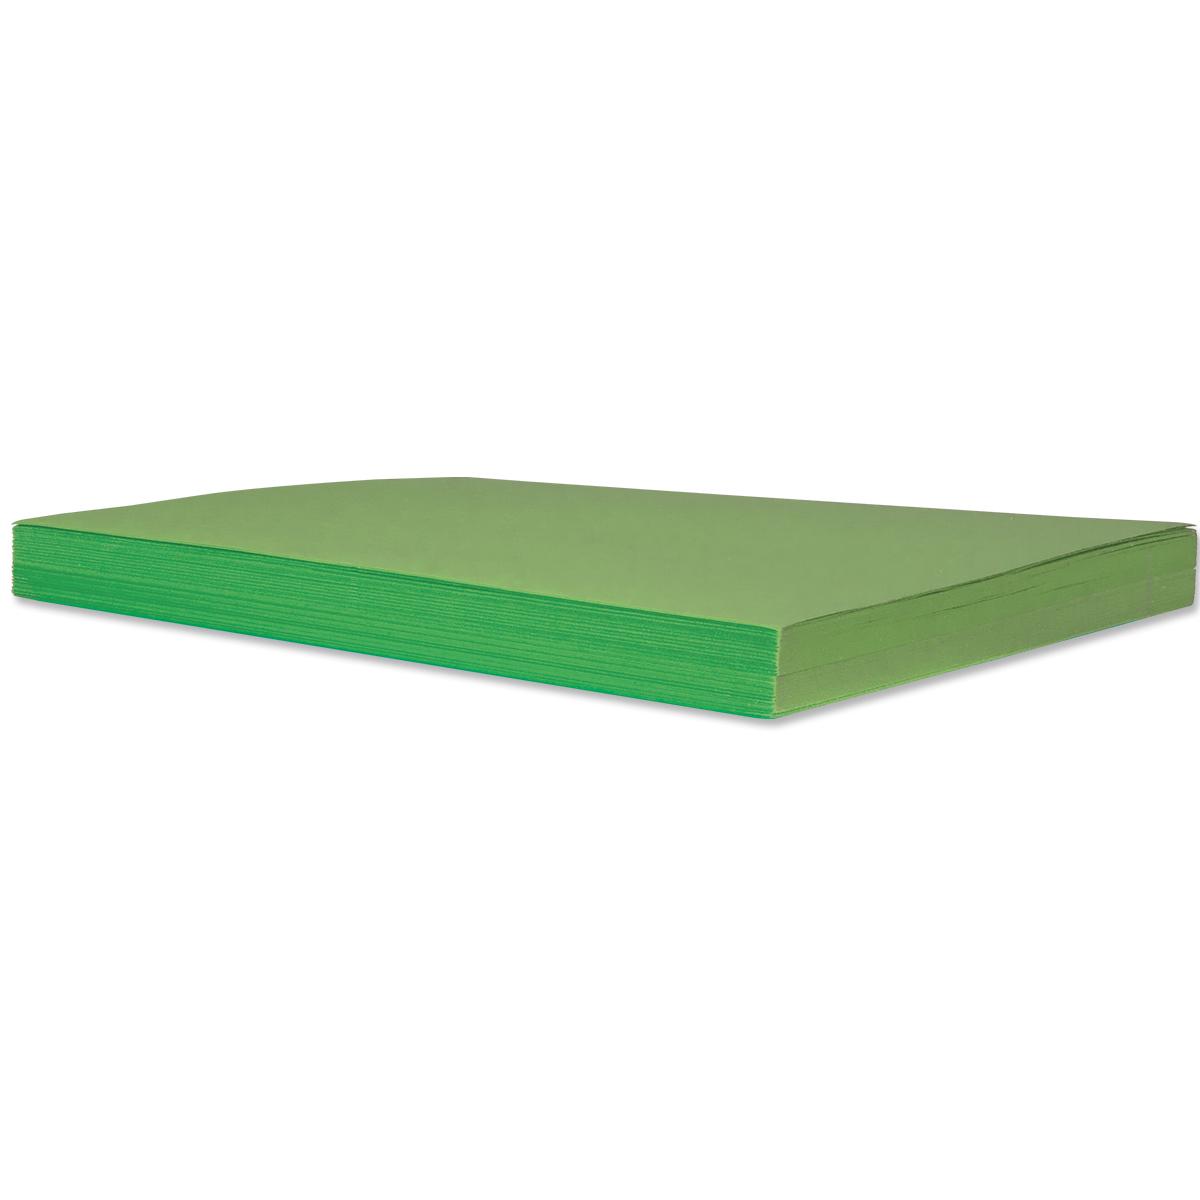 Papier de bricolage 50 feuilles : vert émeraude